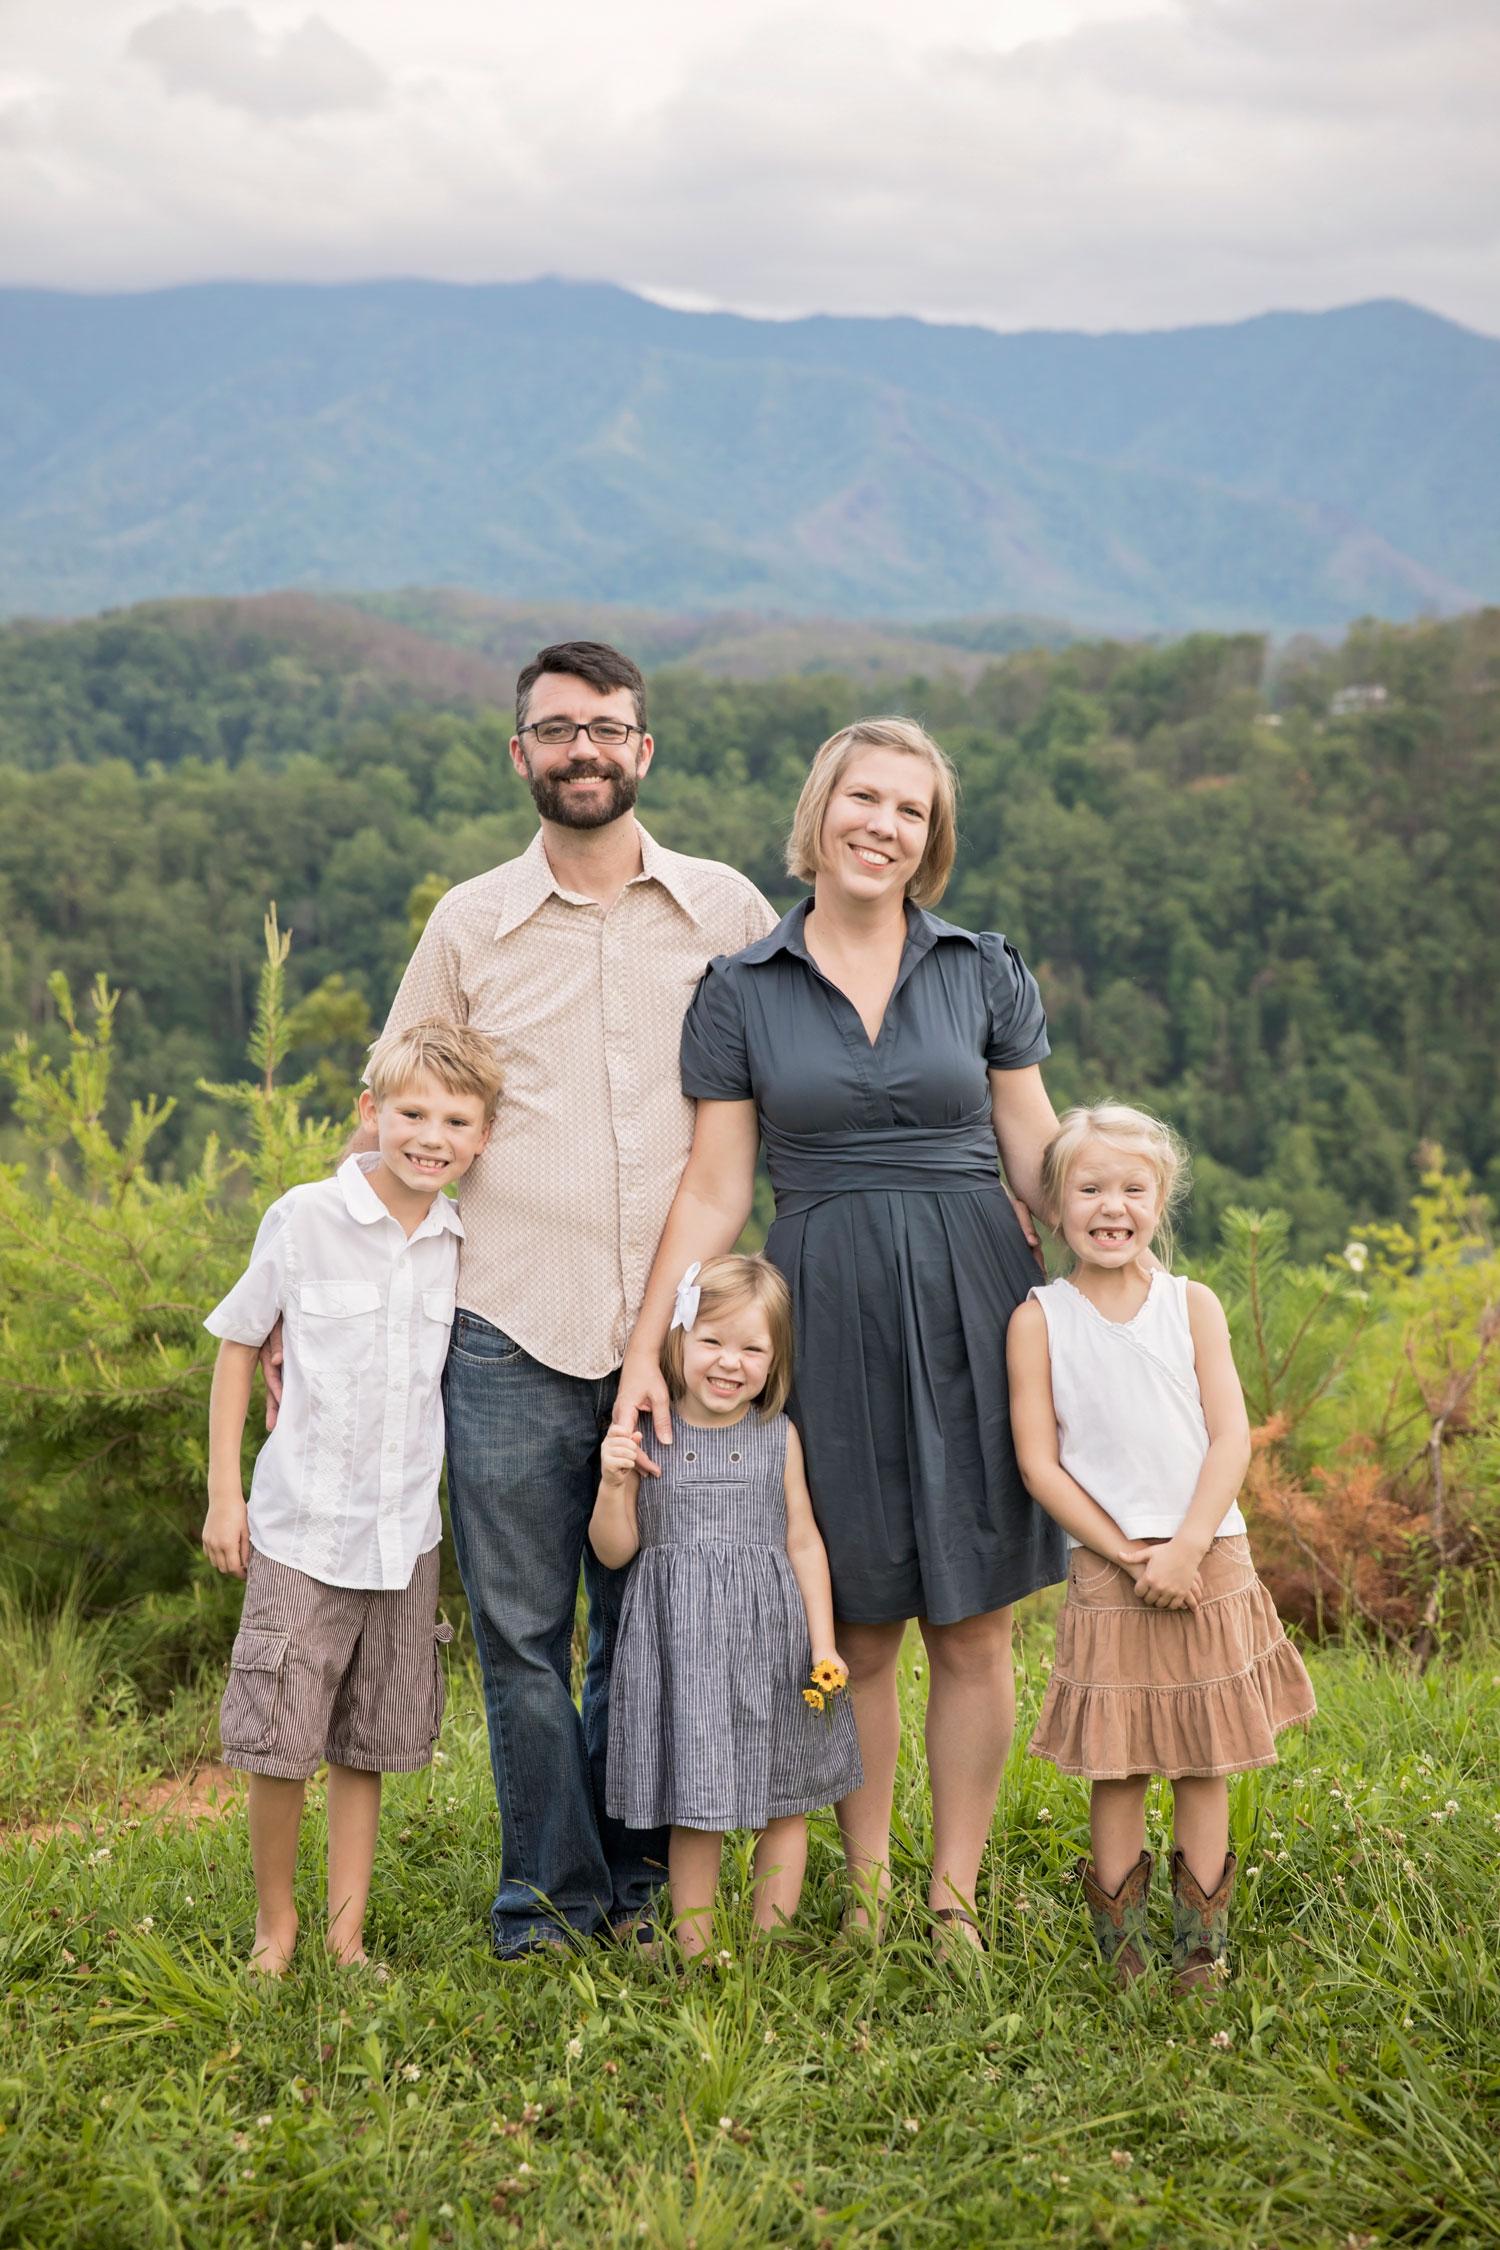 gatlinburg-photographer-smoky-mountain-family-vacation-picture.jpg